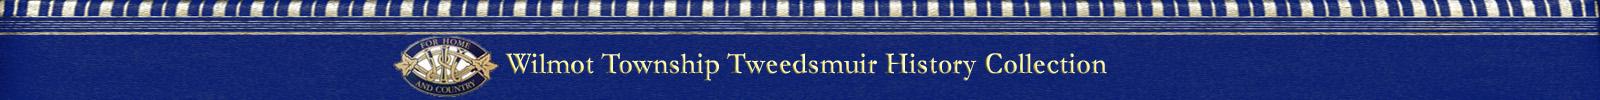 Wilmot Township Tweedsmuir History Collection